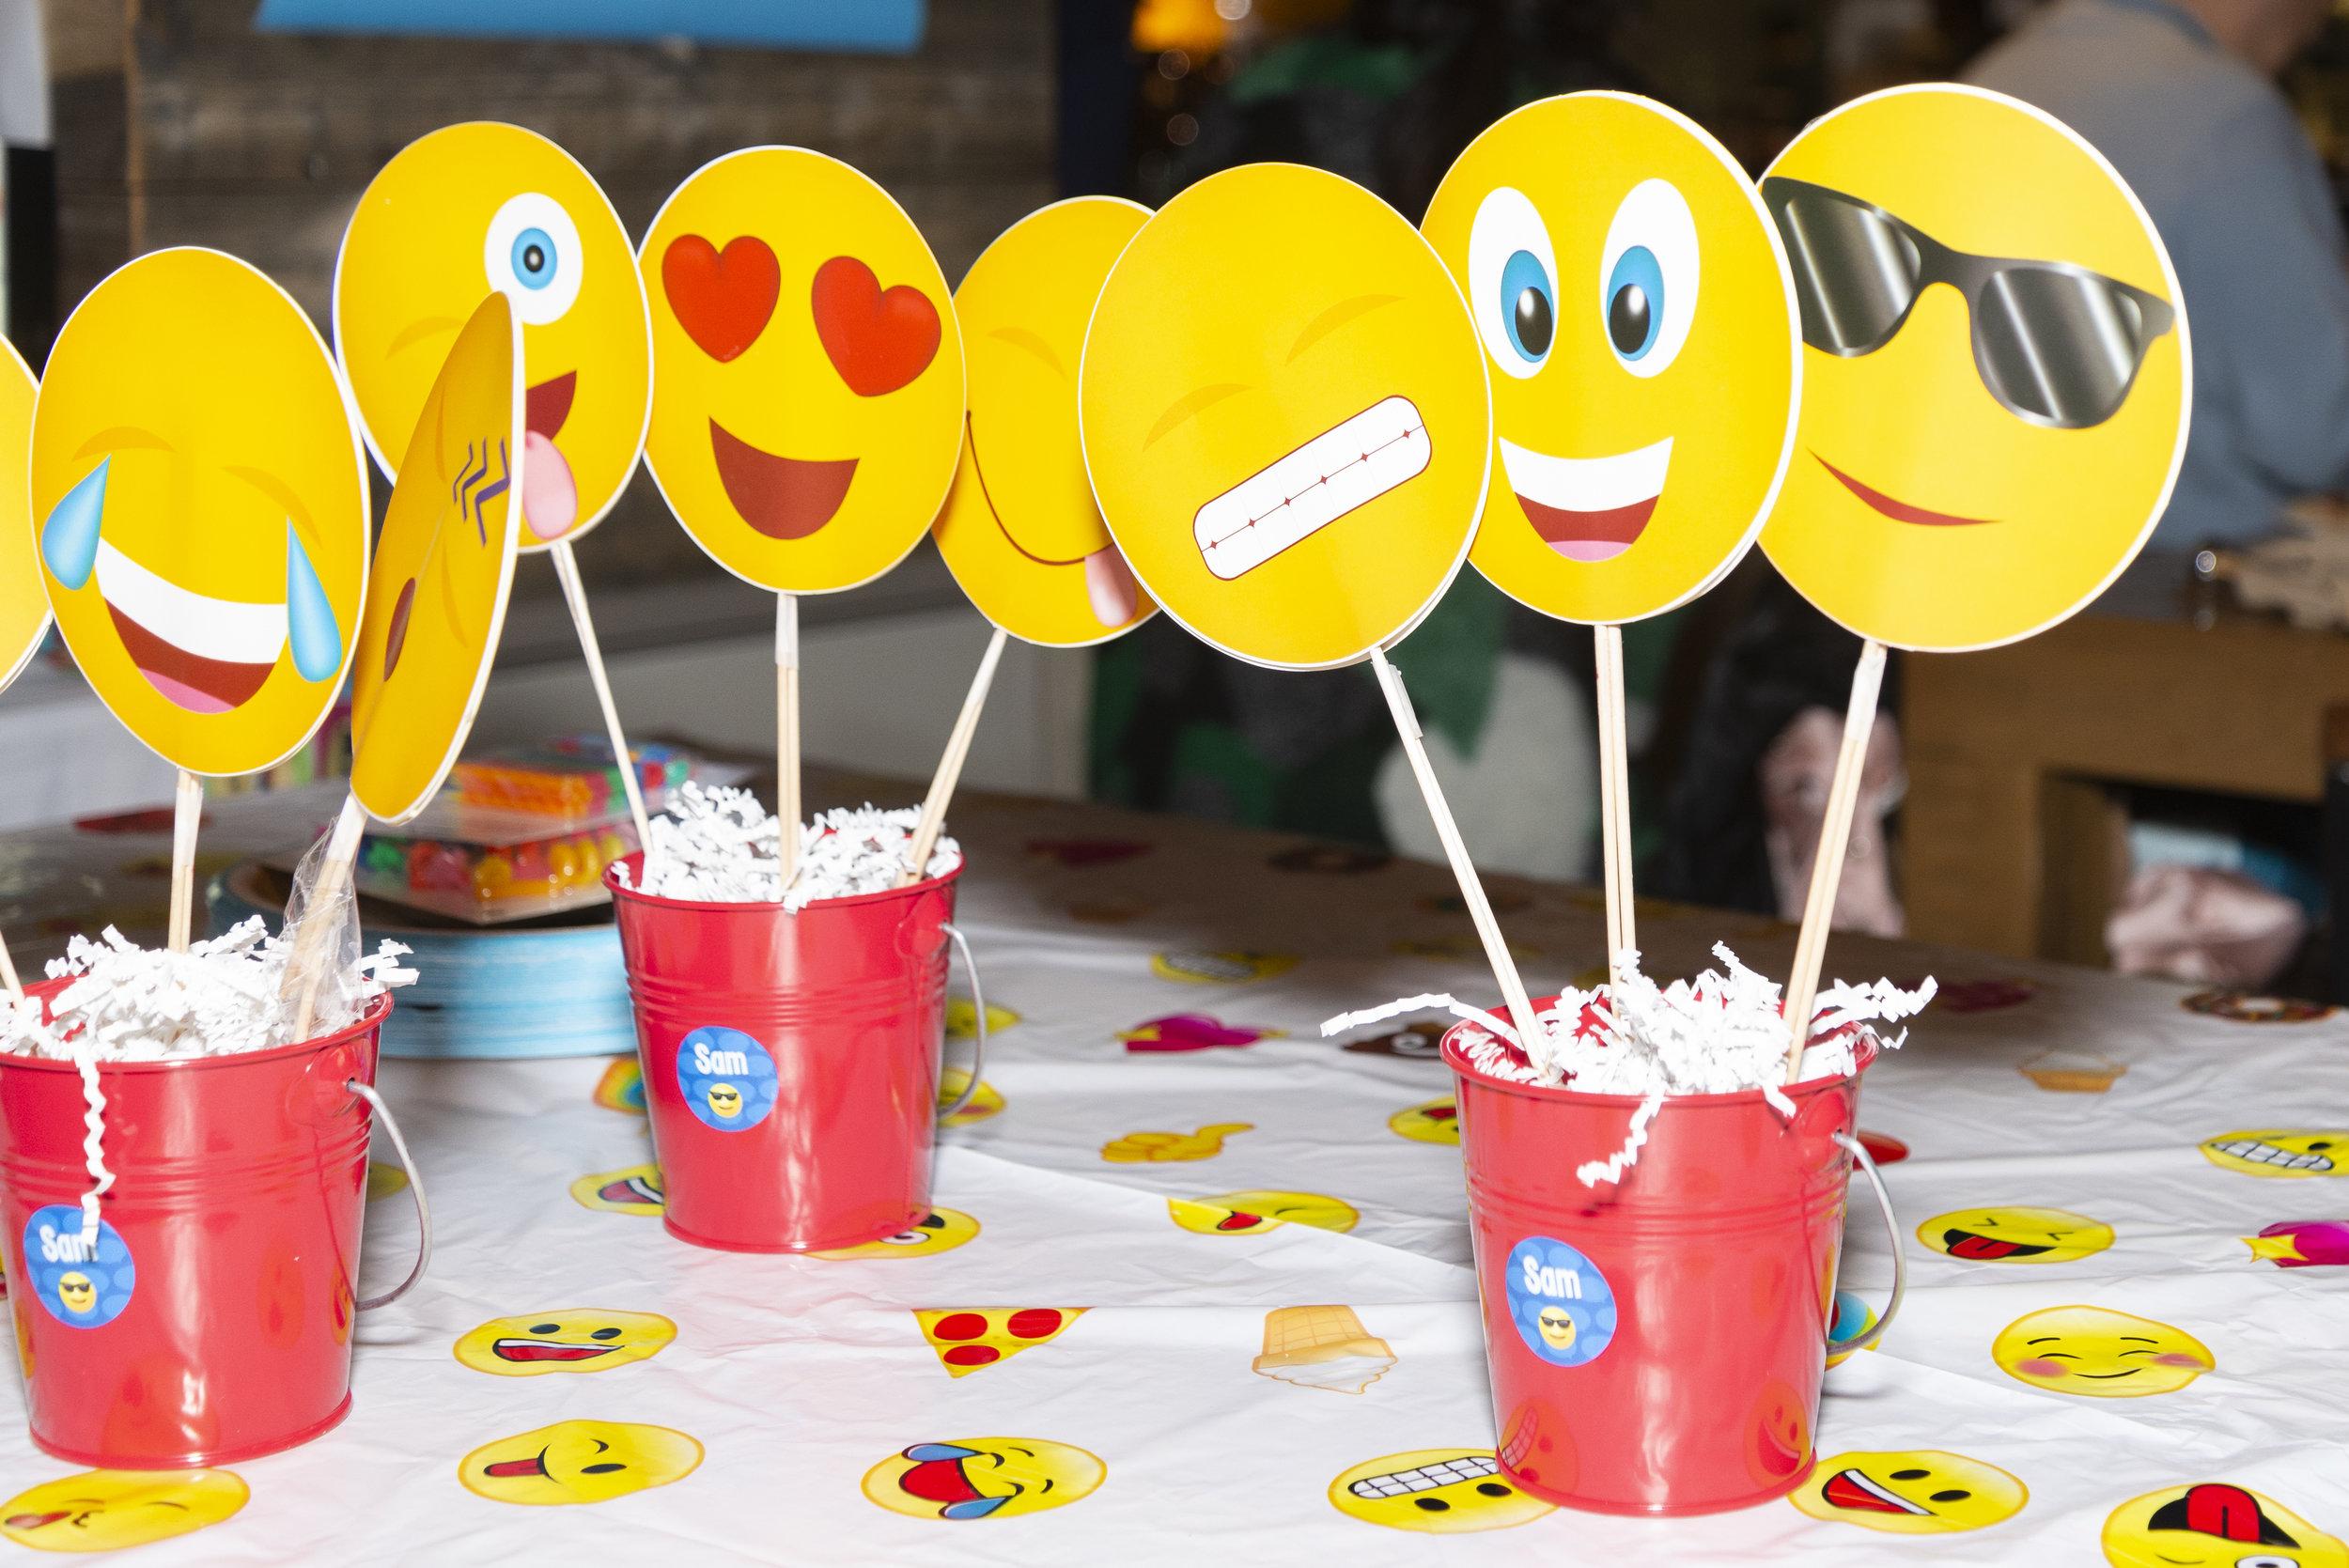 Emoji-themed Pizza Making 4th Birthday Party + Drama — The